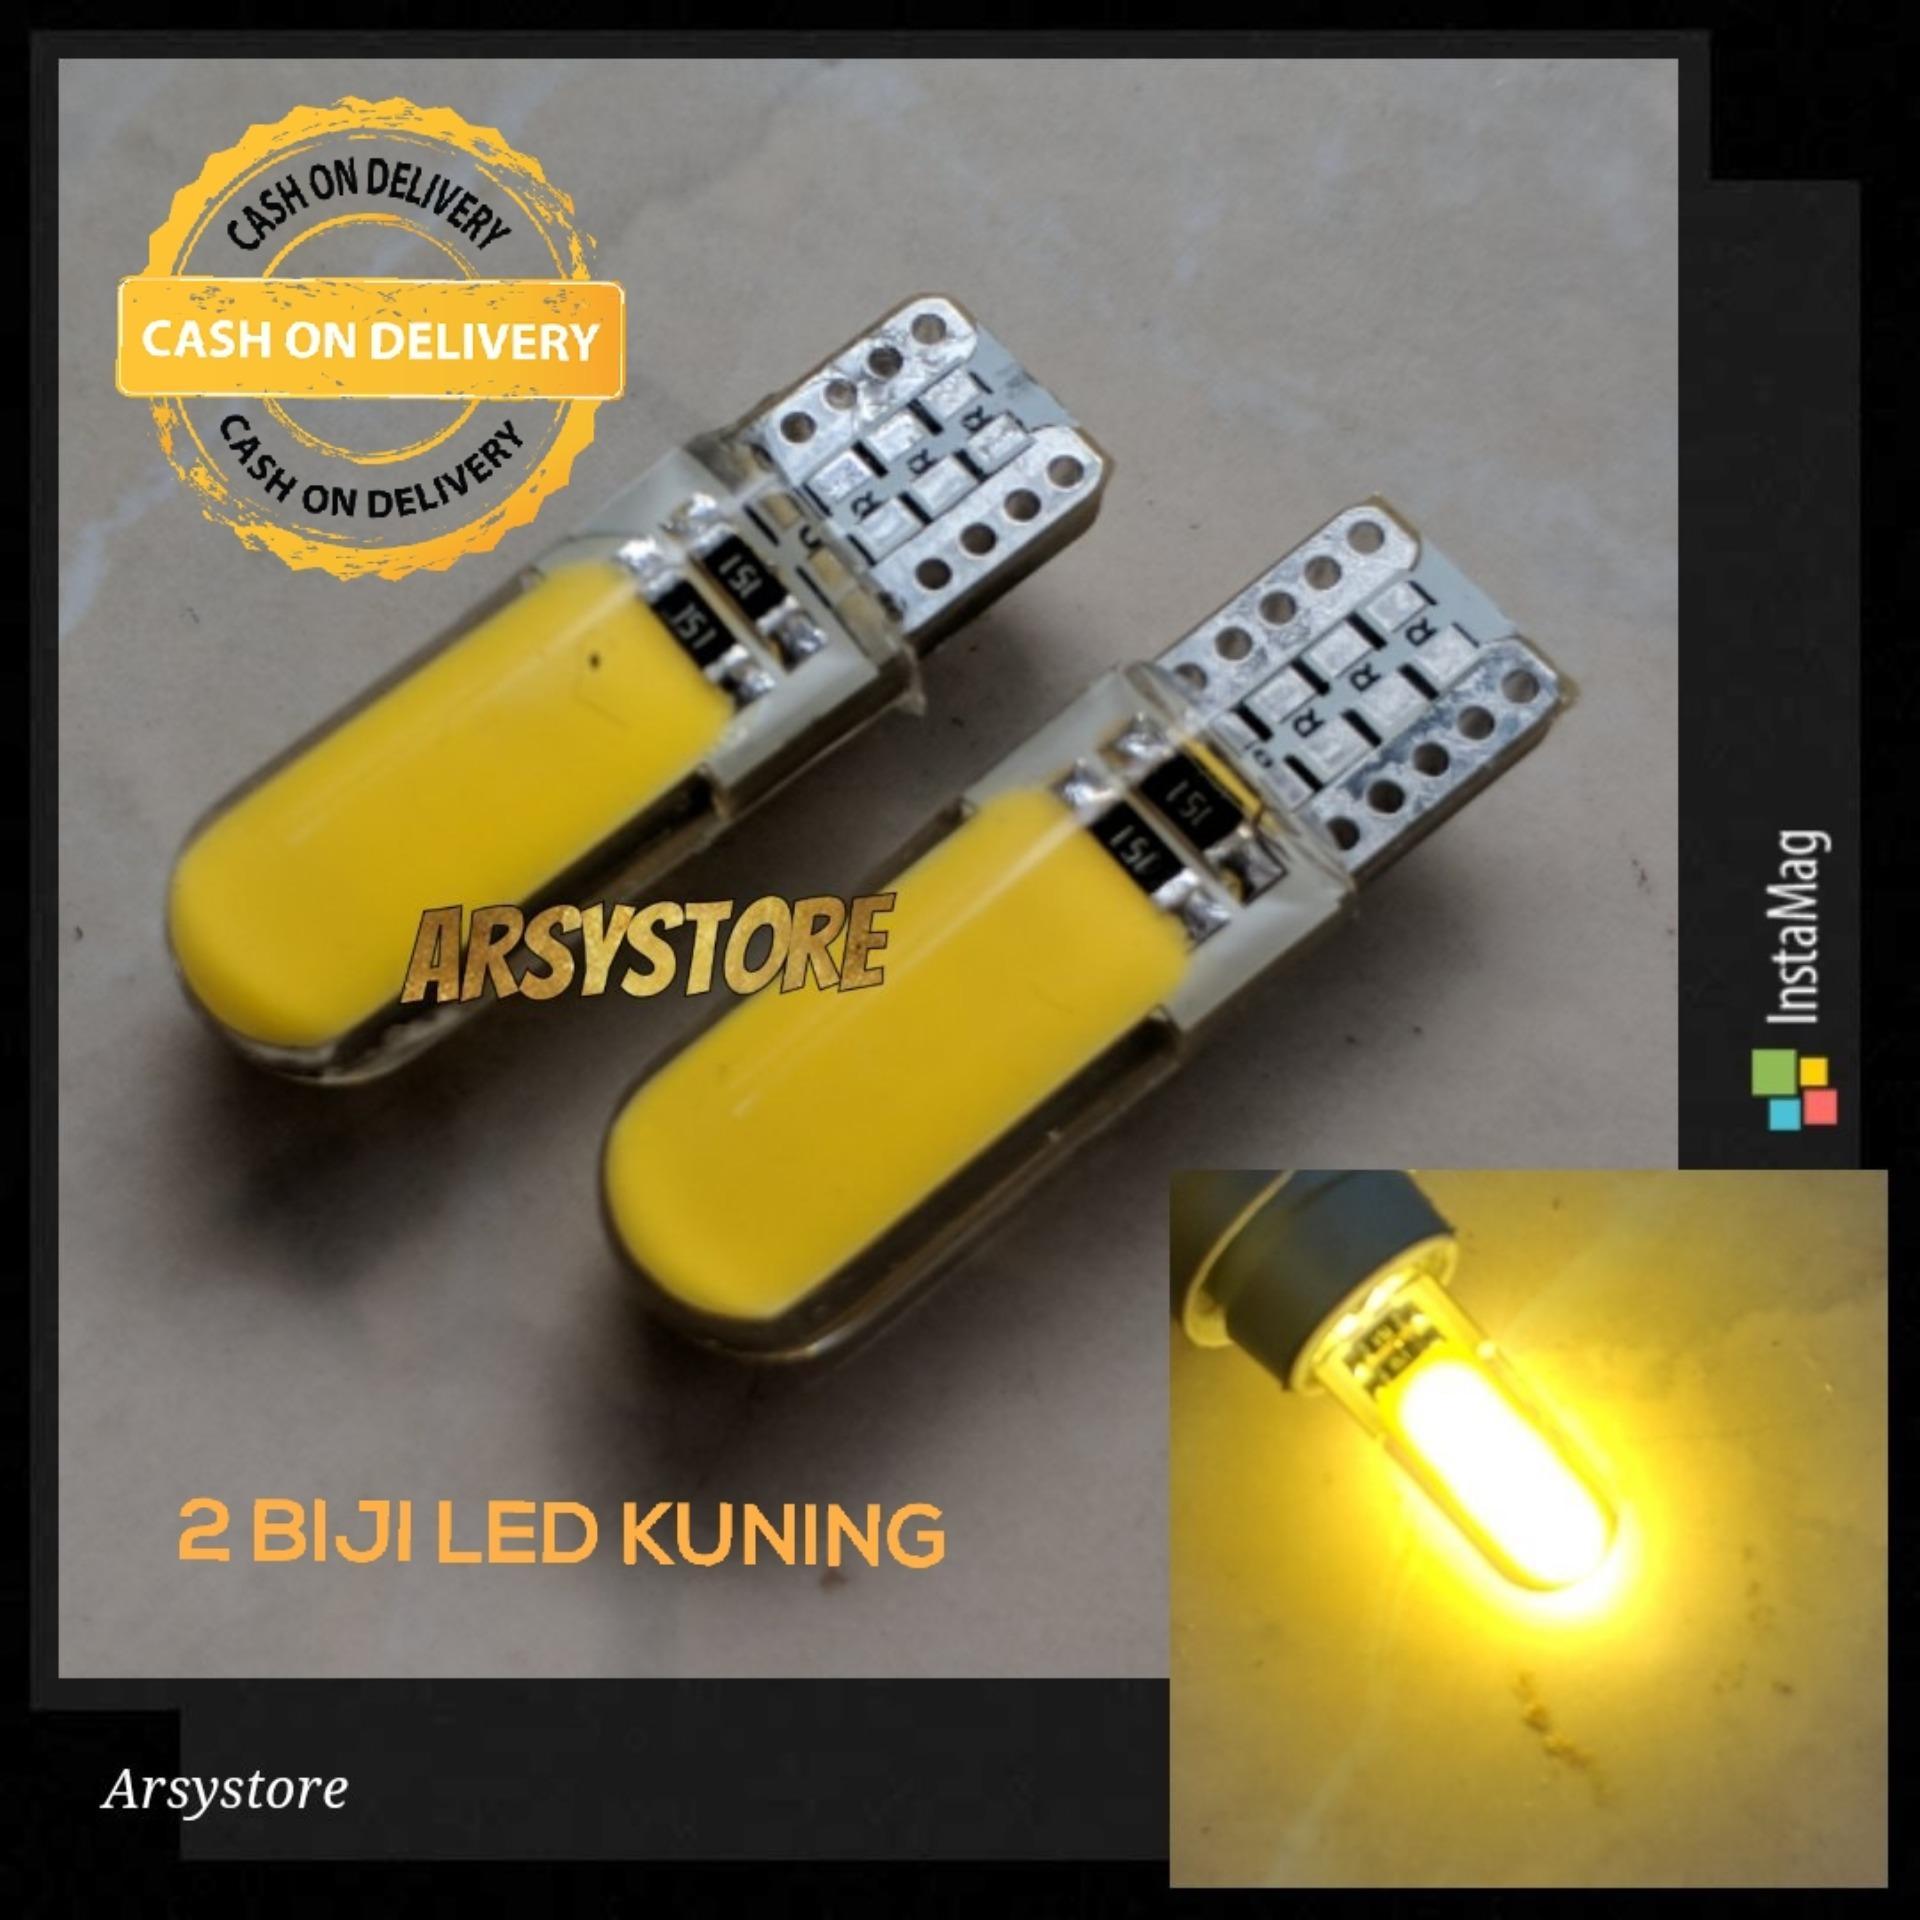 2 Biji Lampu LED T10 COB PLASMA SILICON Jelly METAL Soket Senja Sein Plat nomor mundur 12V Mobil Motor ARSYSTORE - KUNING